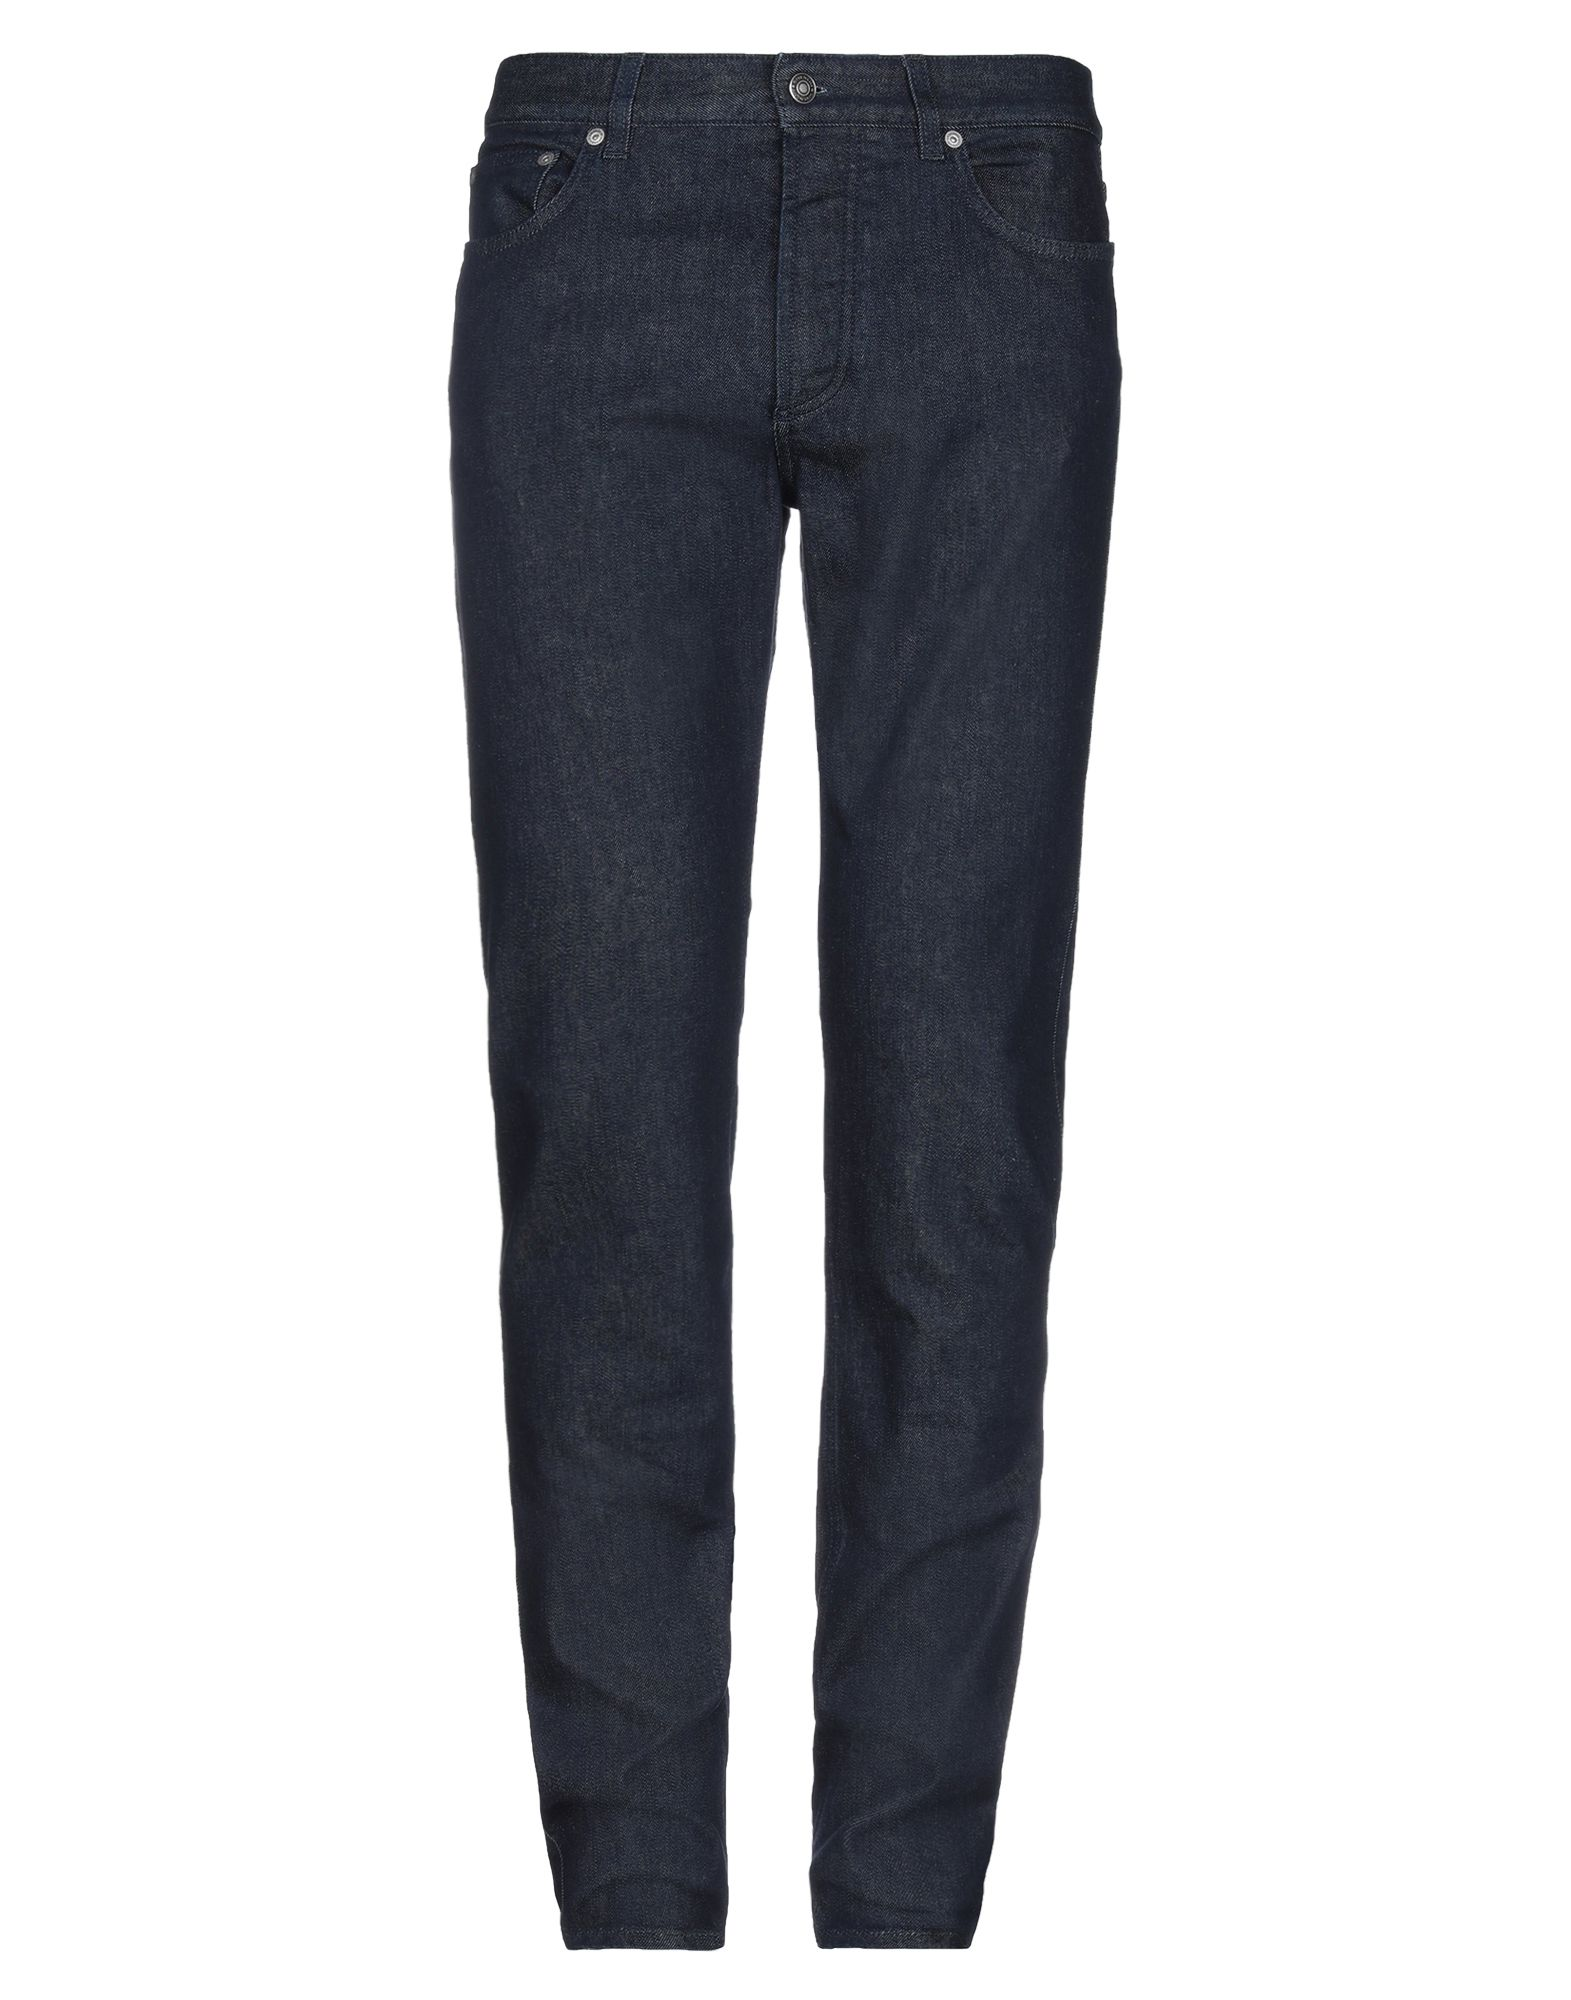 GIVENCHY Denim pants - Item 42789237